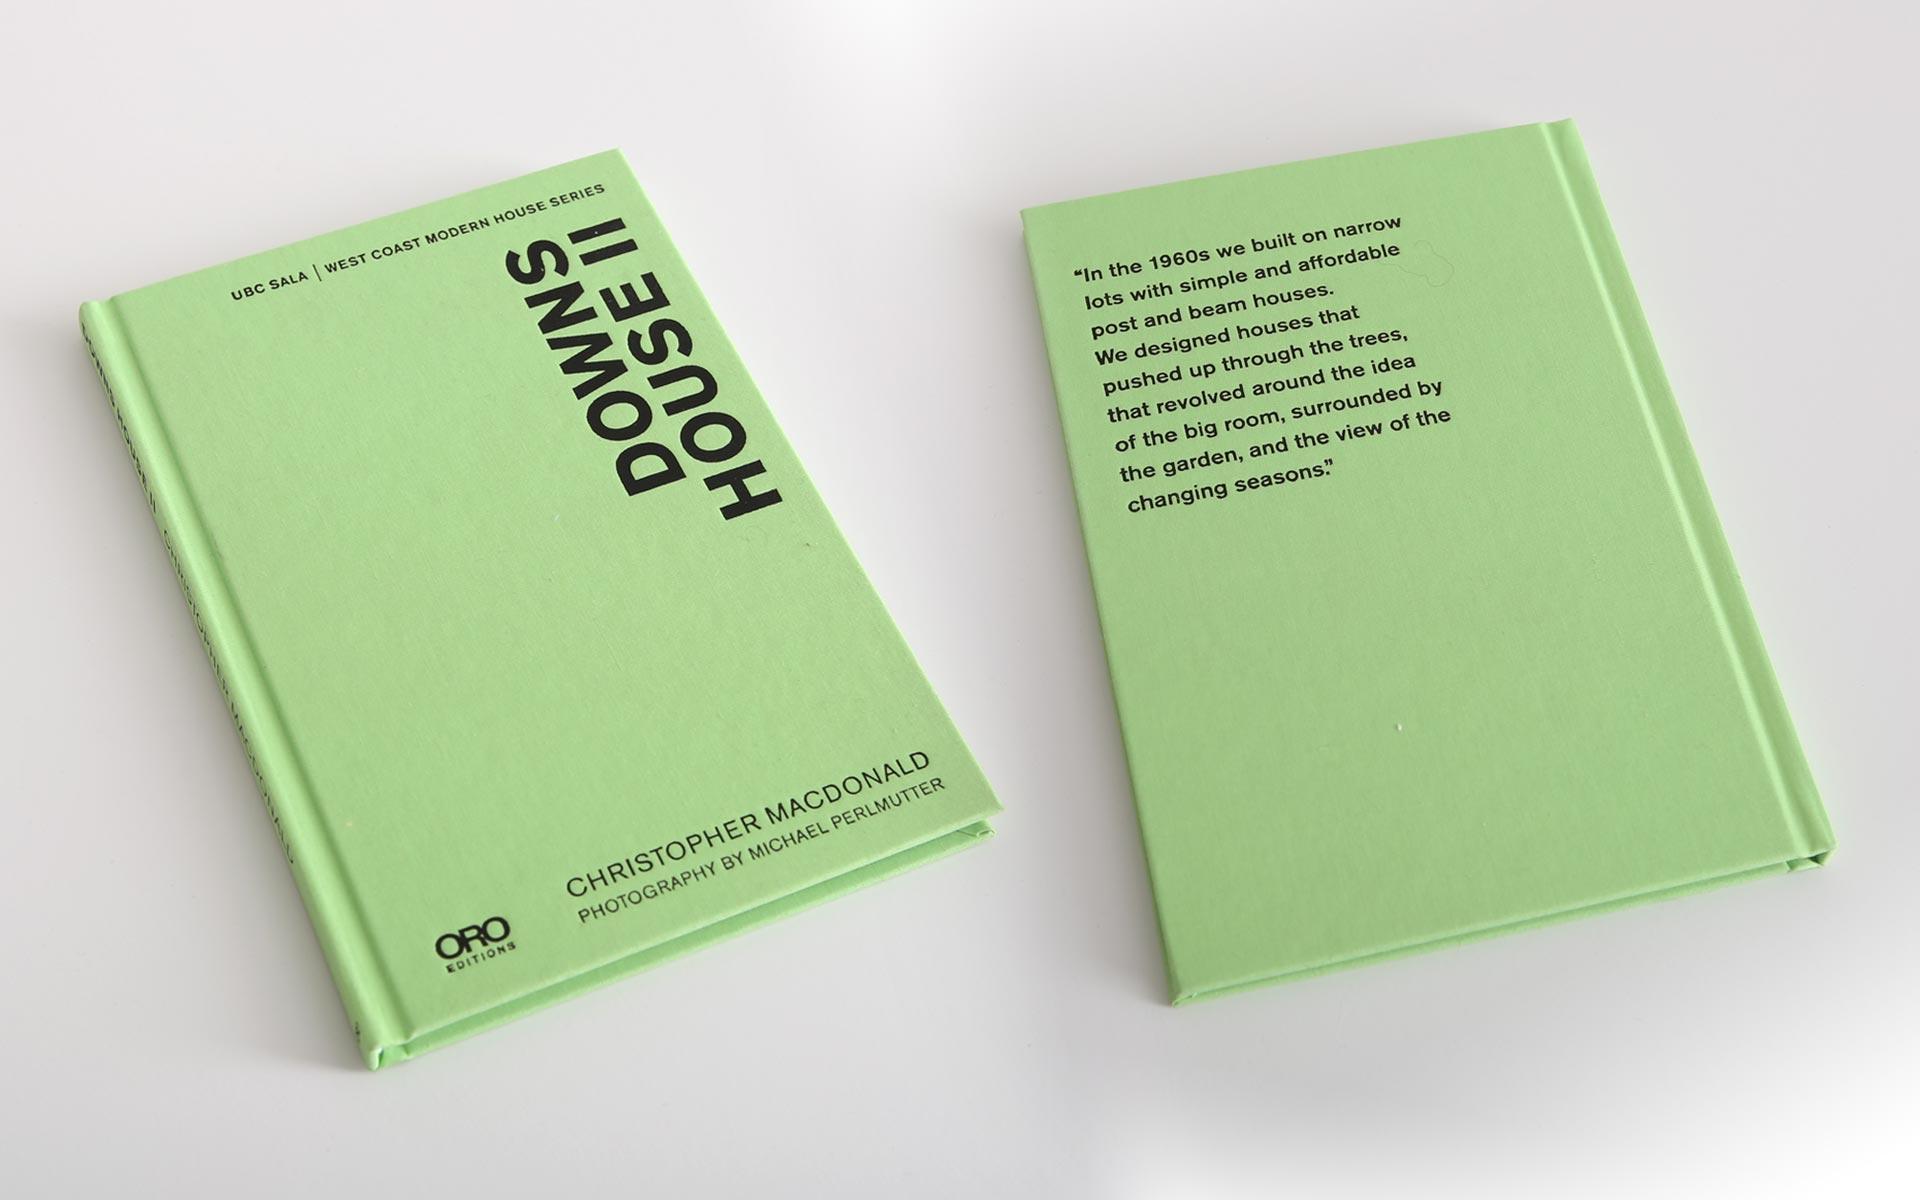 ubc-sala-book-design-1